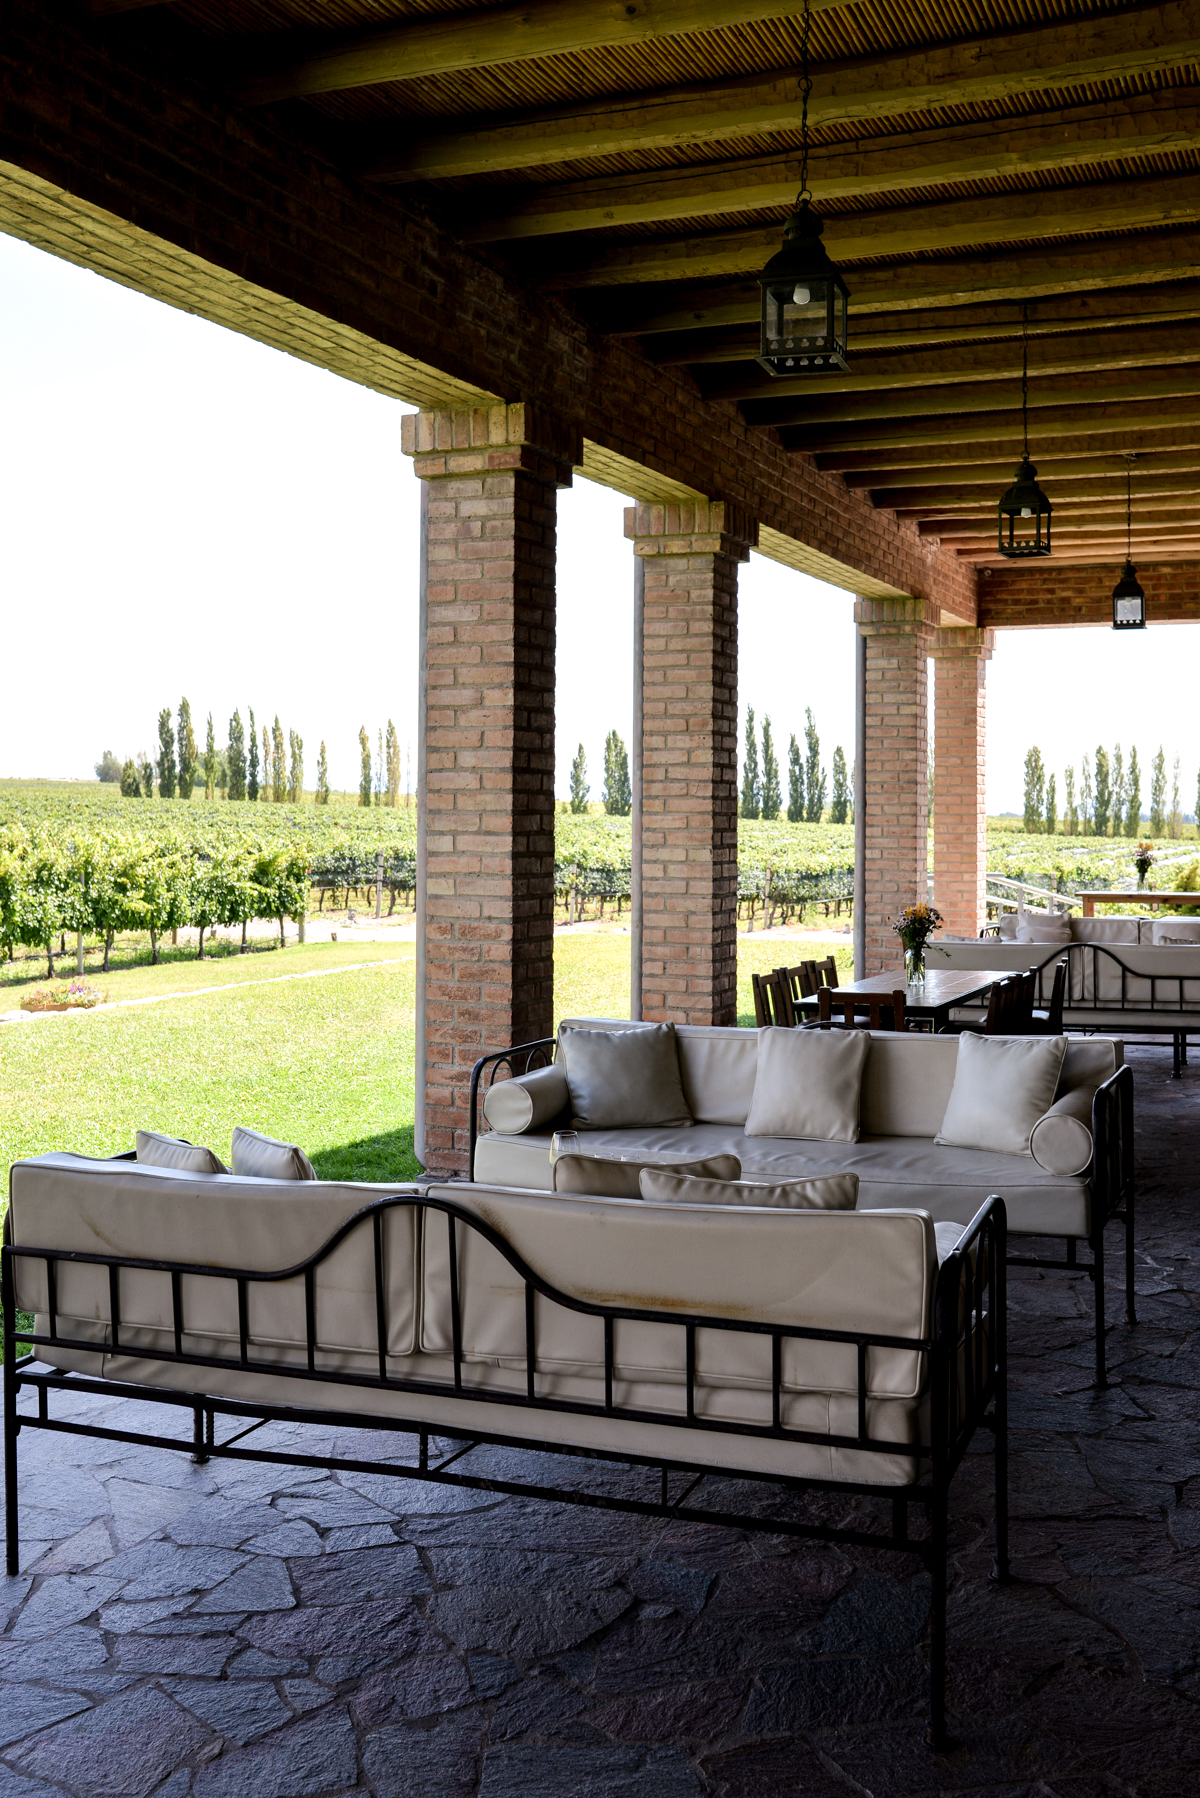 Stacie-Flinner-Best-Mendoza-Winery-9